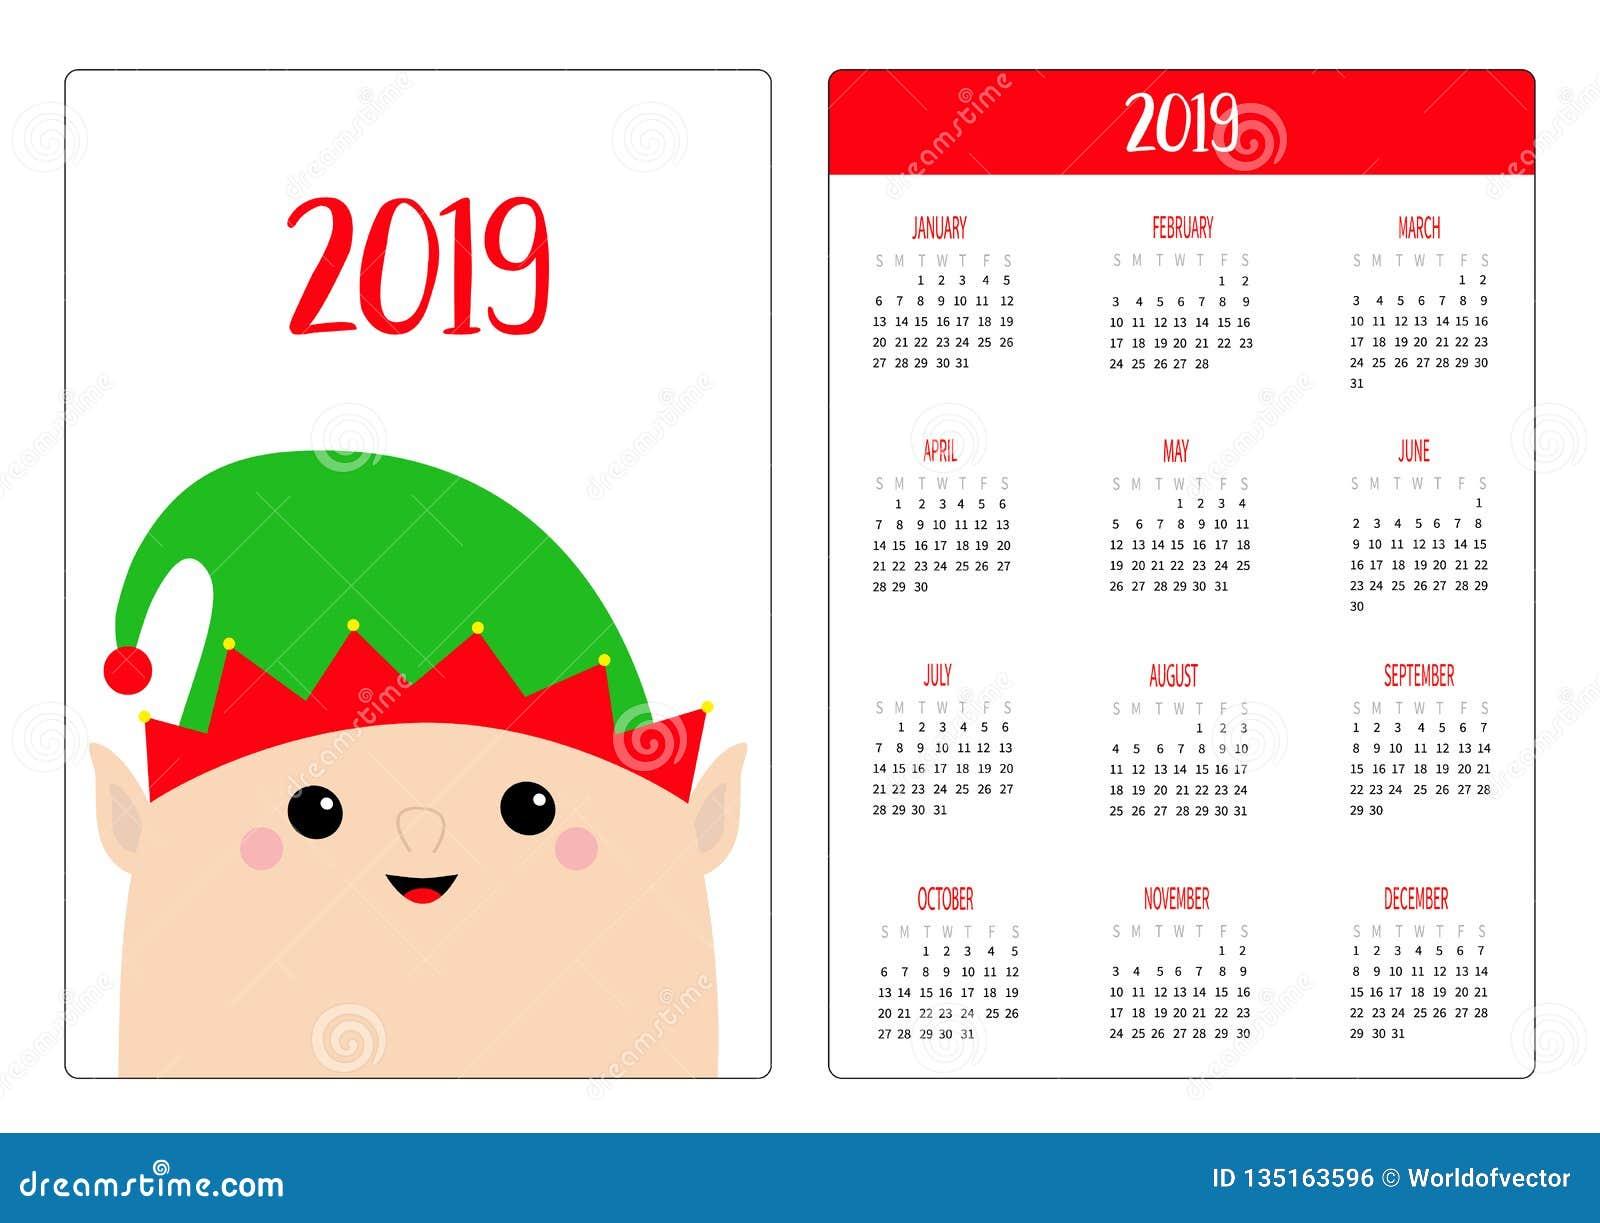 December Elf Calendar 2019 Santa Claus Elf Face Head. Simple Pocket Calendar Layout 2019 New